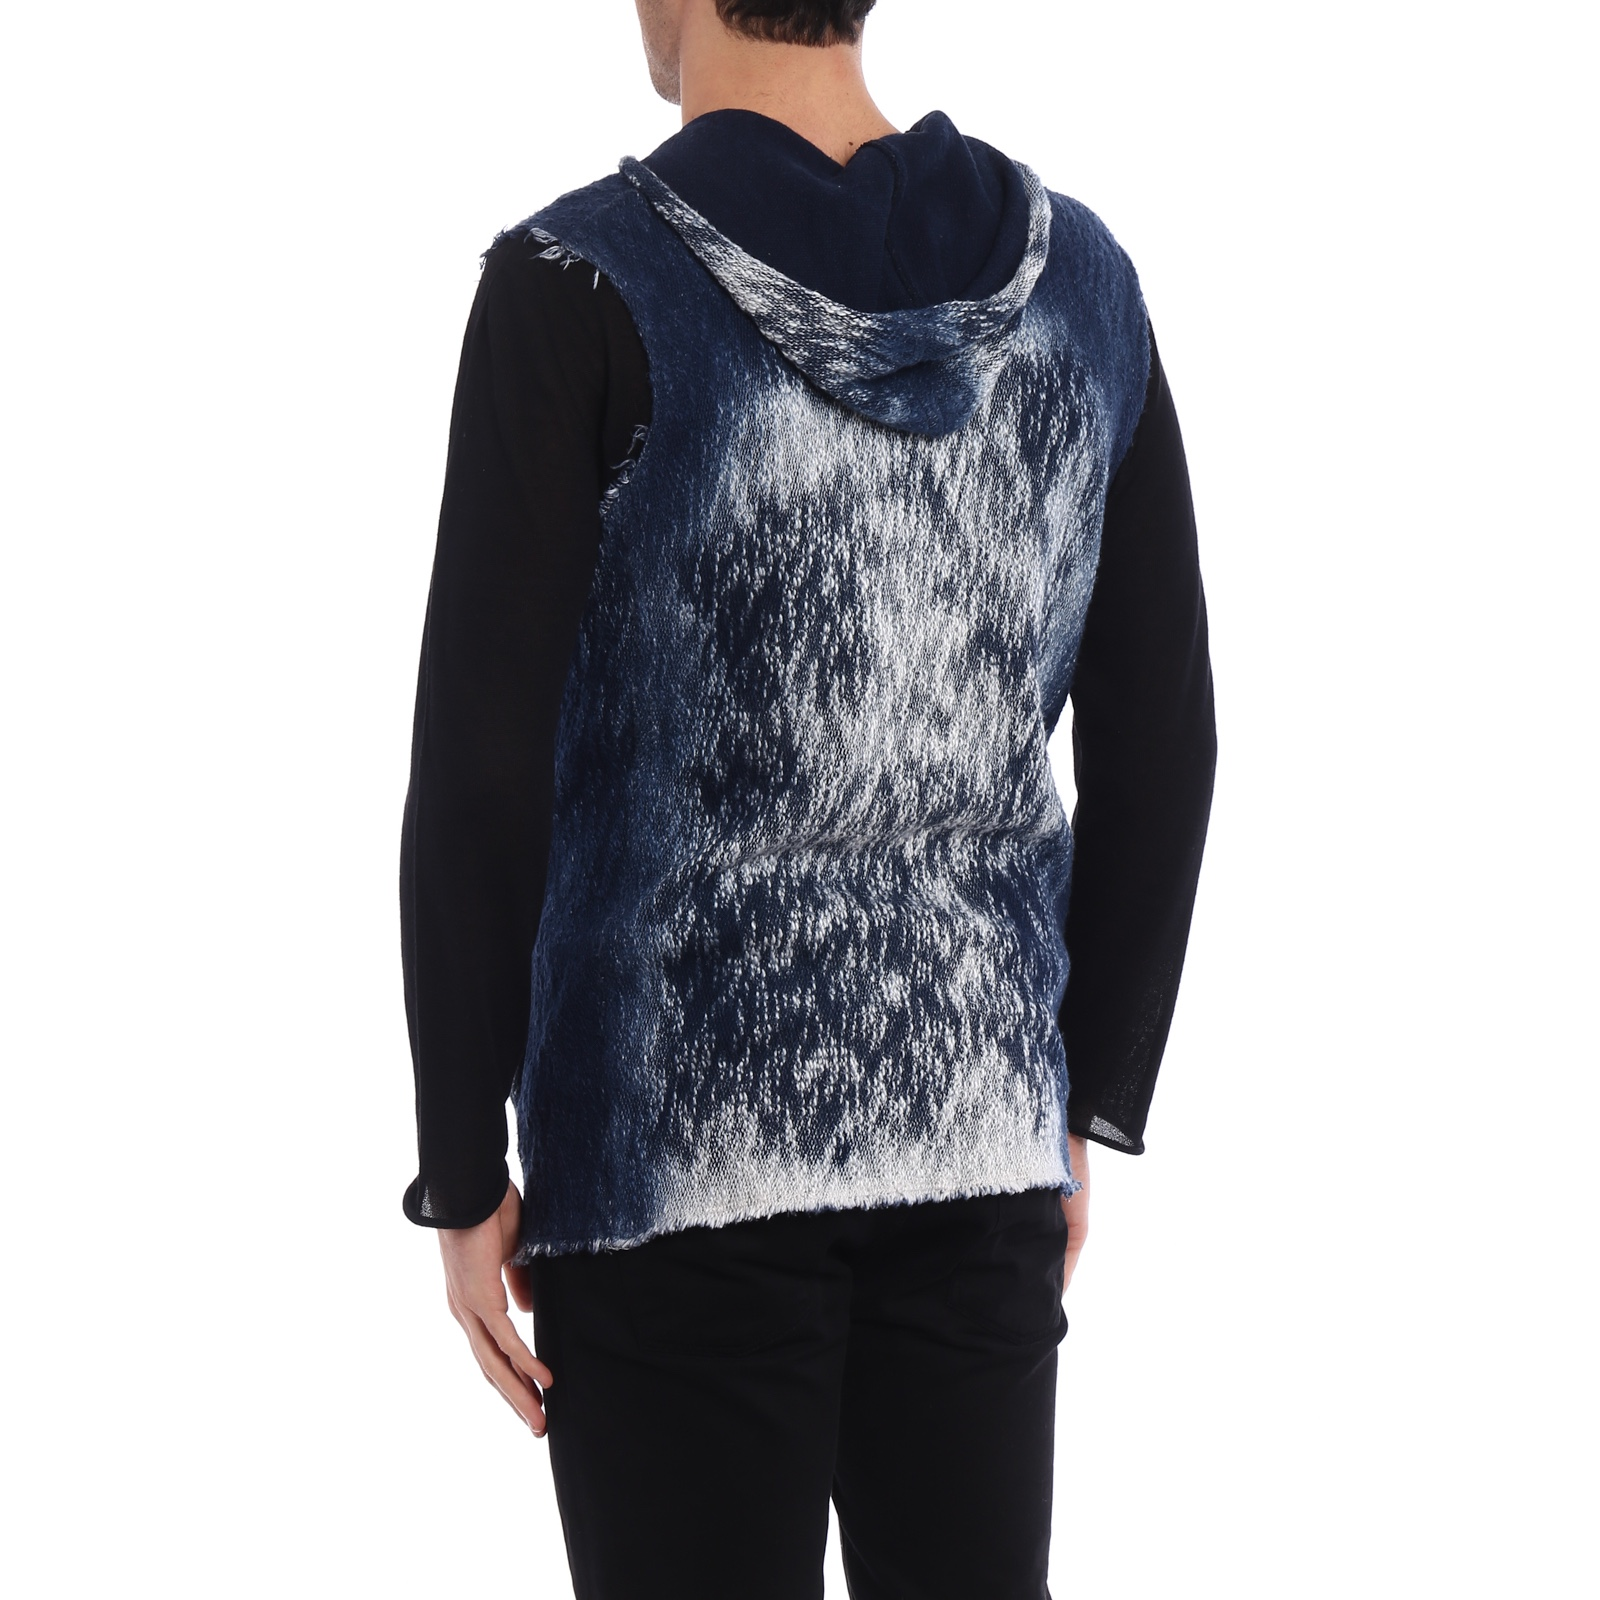 malfil-cotton-sleeveless-cardigan-shop-online-avant-toi-00000121358f00s004.jpg